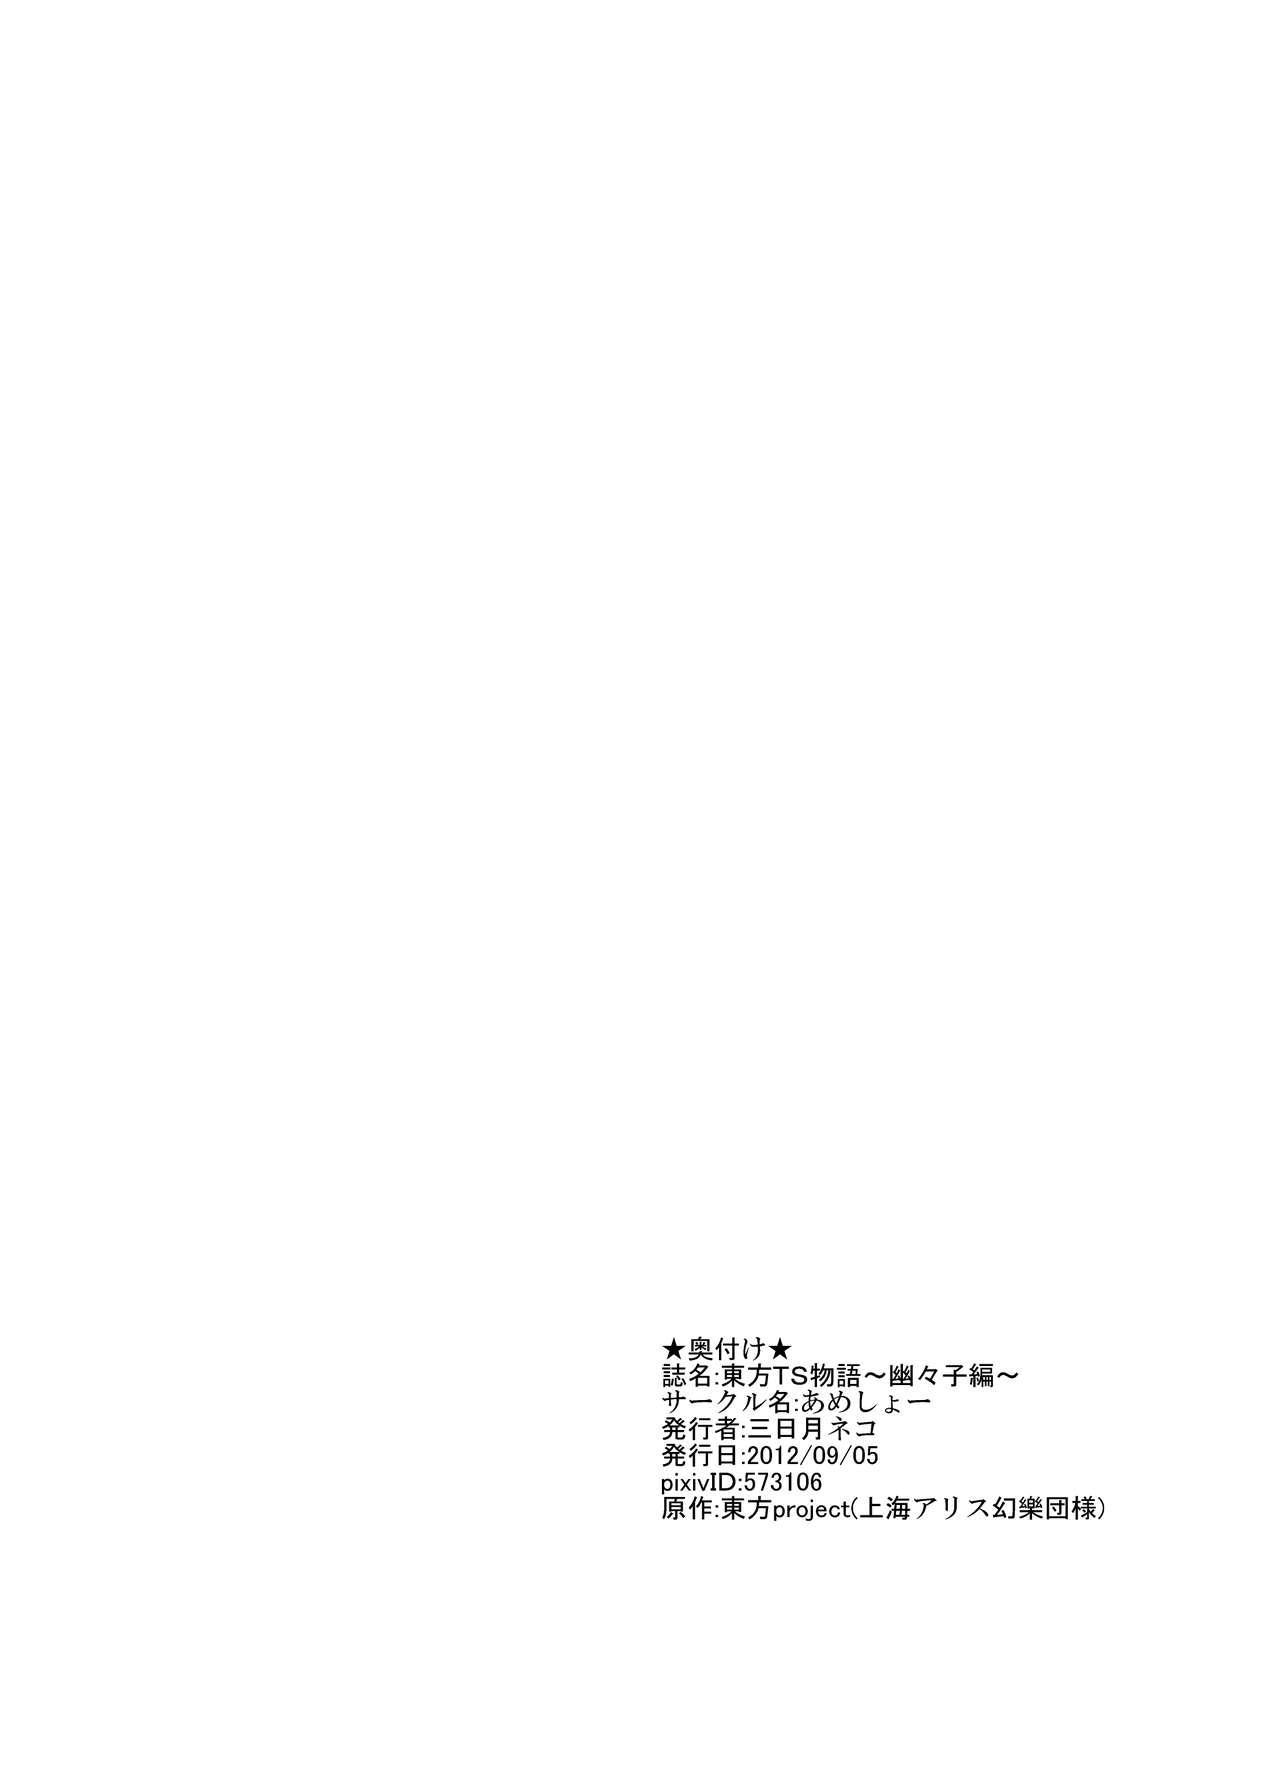 Touhou TS monogatari 21